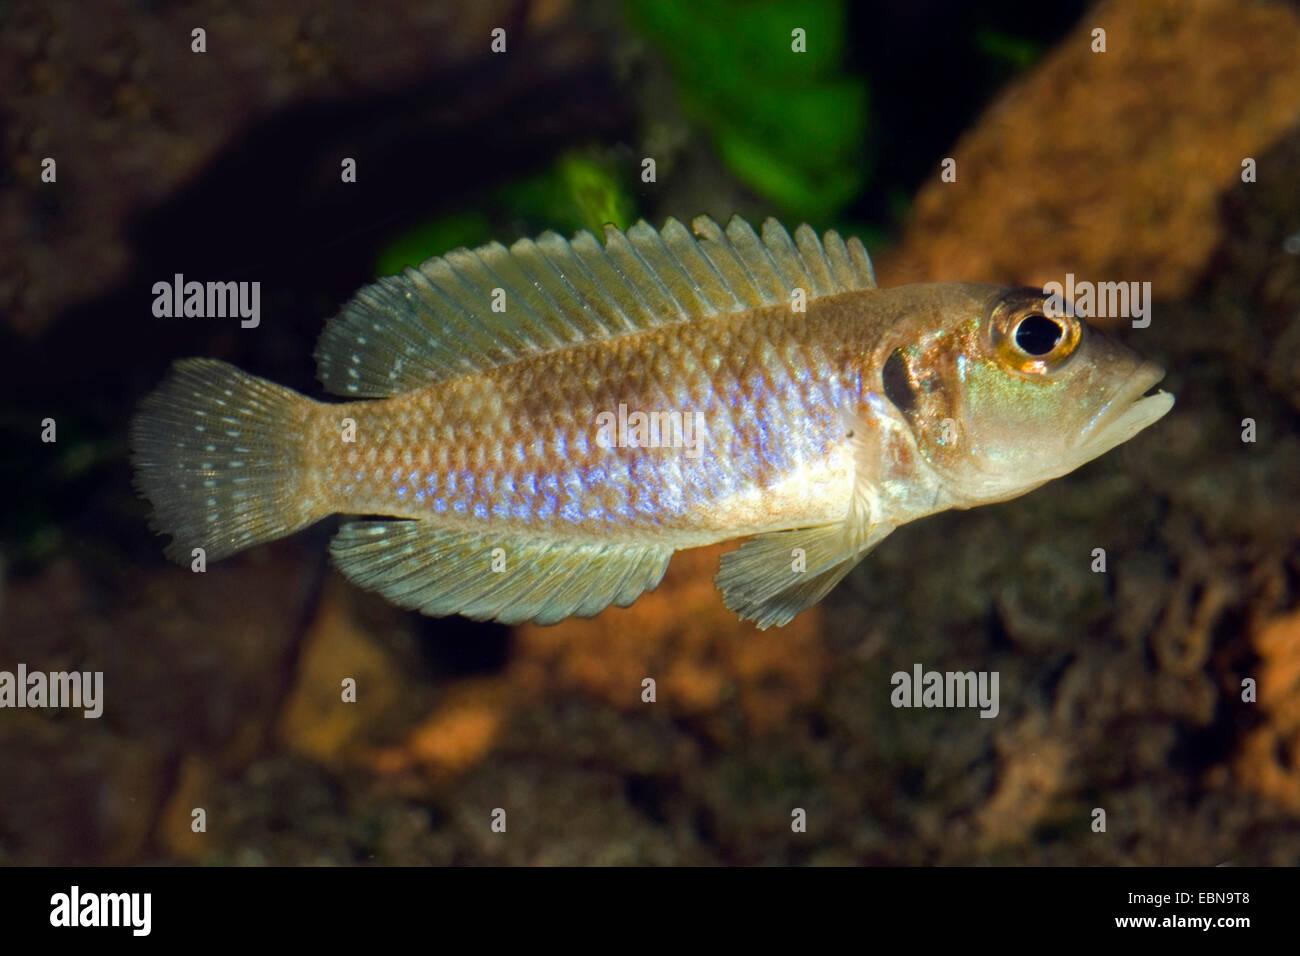 Shell Tanganjika Cichlid (Telmatochromis vittatus), natación Imagen De Stock